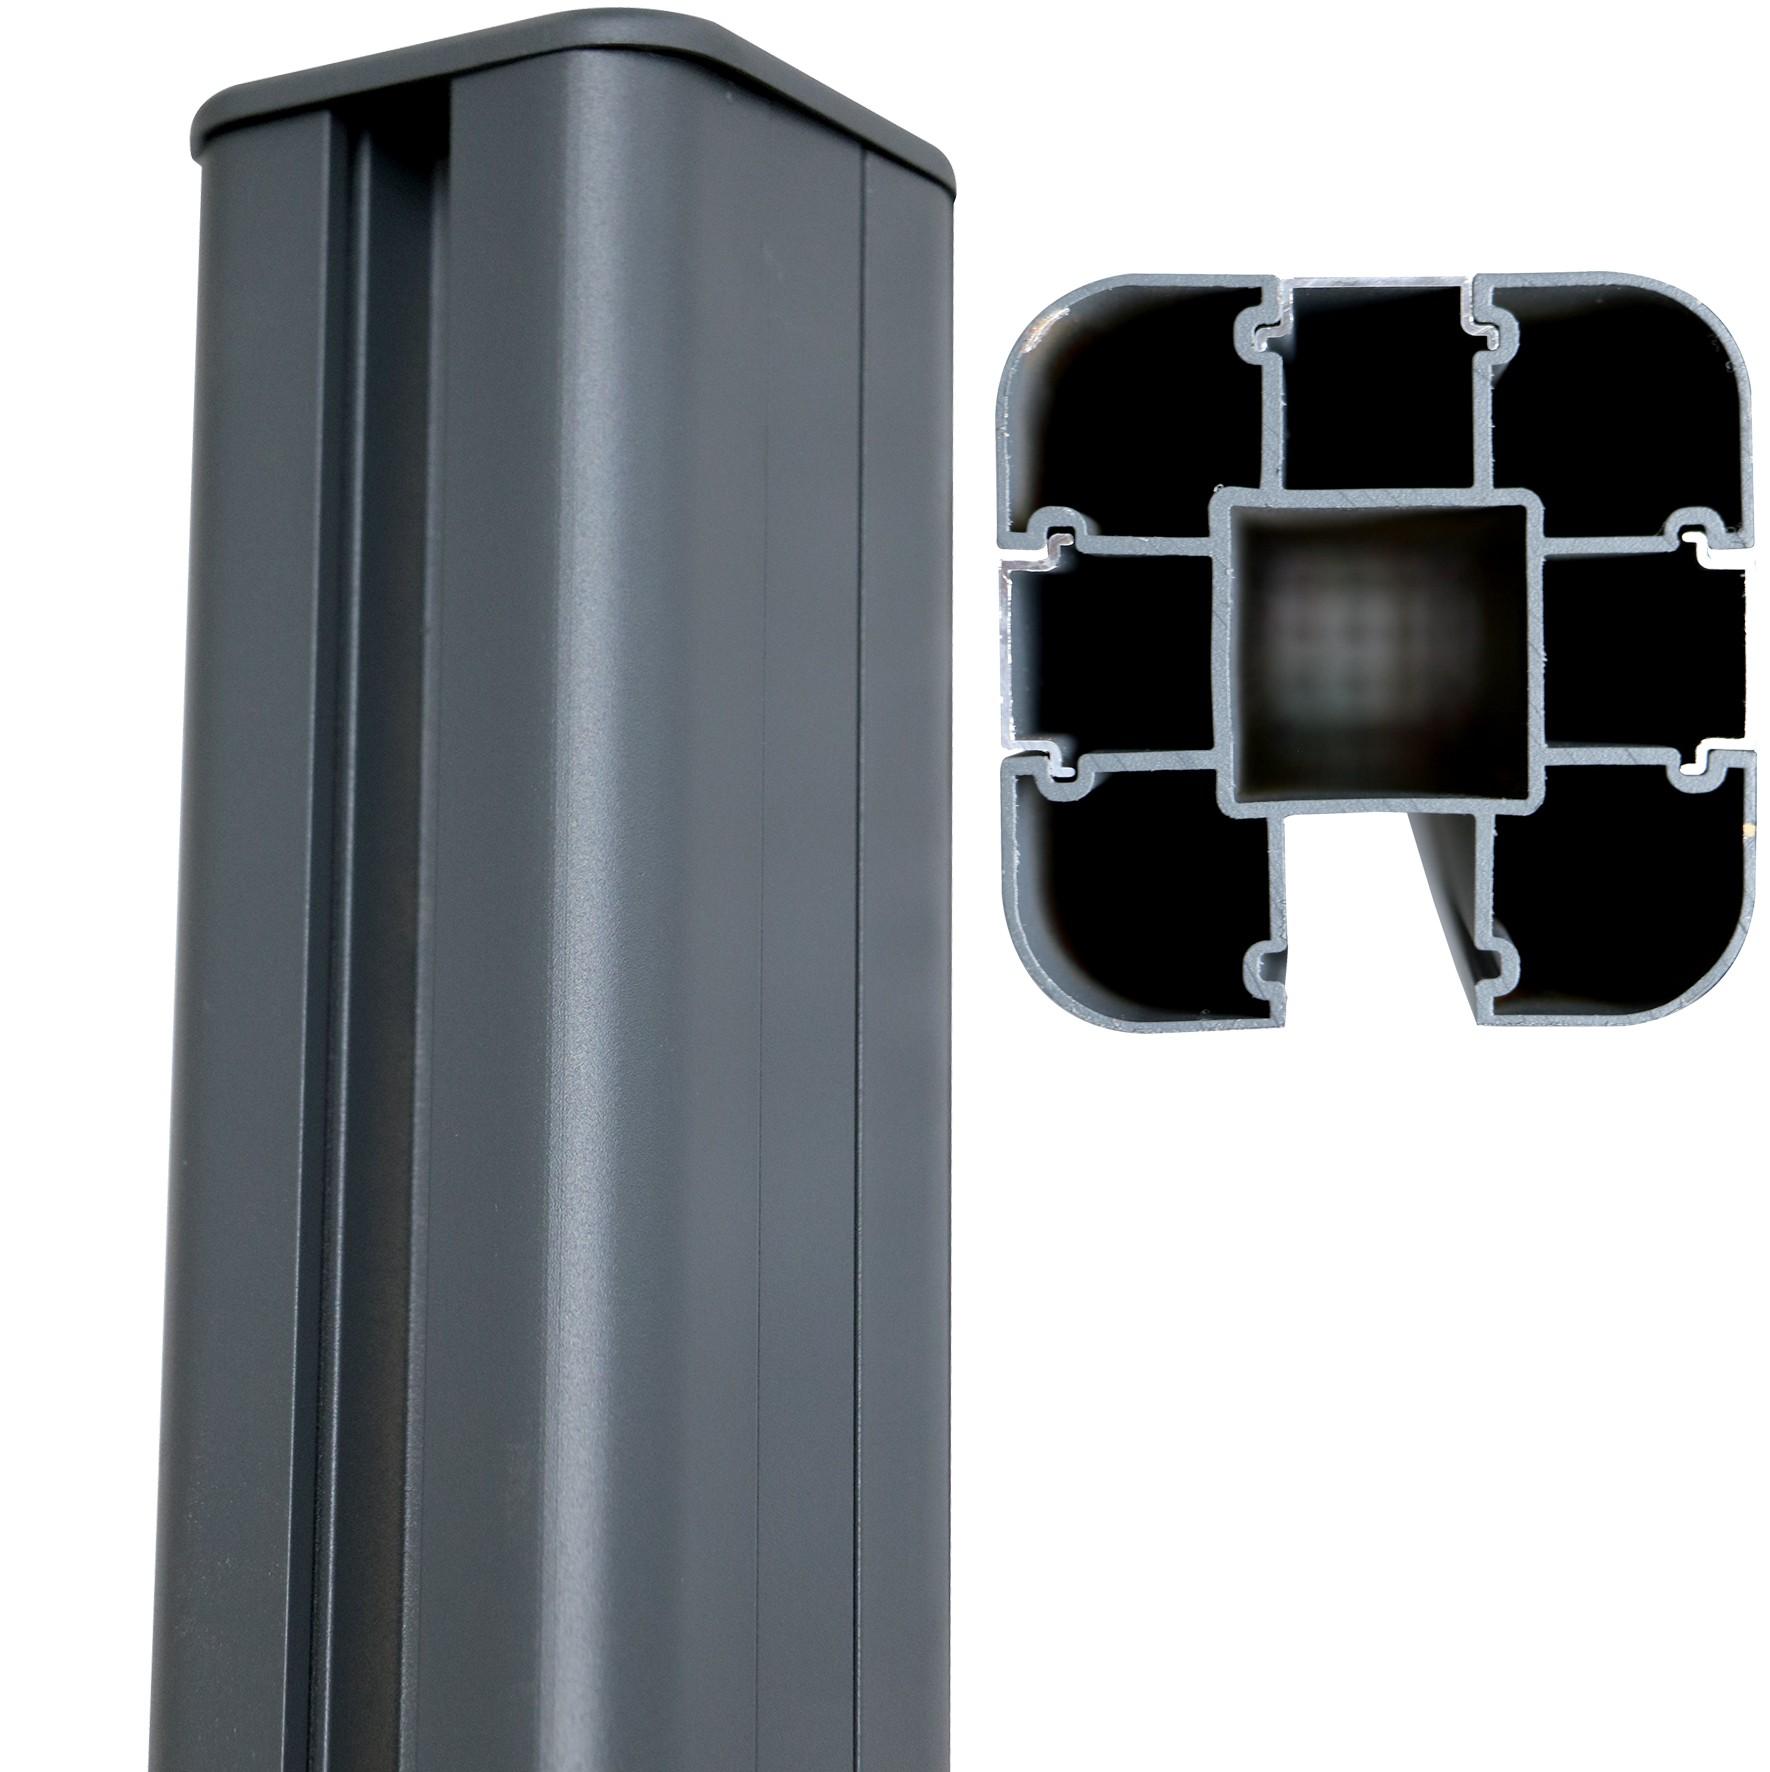 poteau alu pour pergola stunning poteau alu pour veranda cheap fabulous interesting pergola en. Black Bedroom Furniture Sets. Home Design Ideas